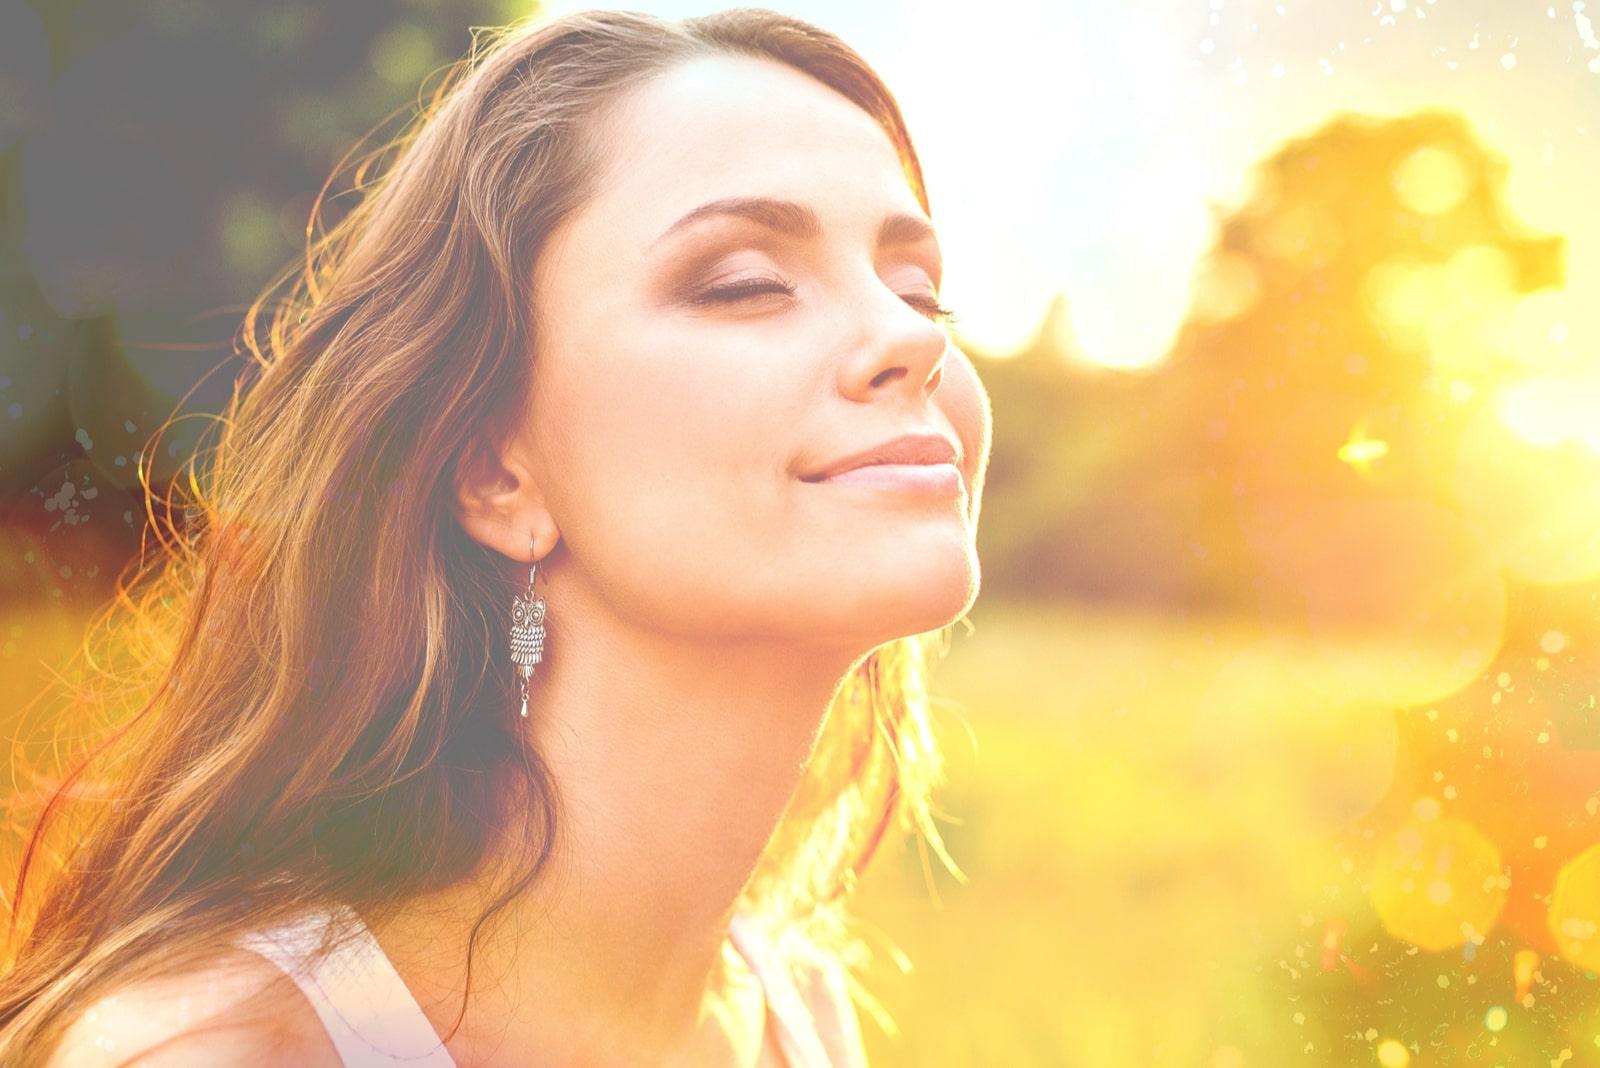 beautiful woman in nature, smiling